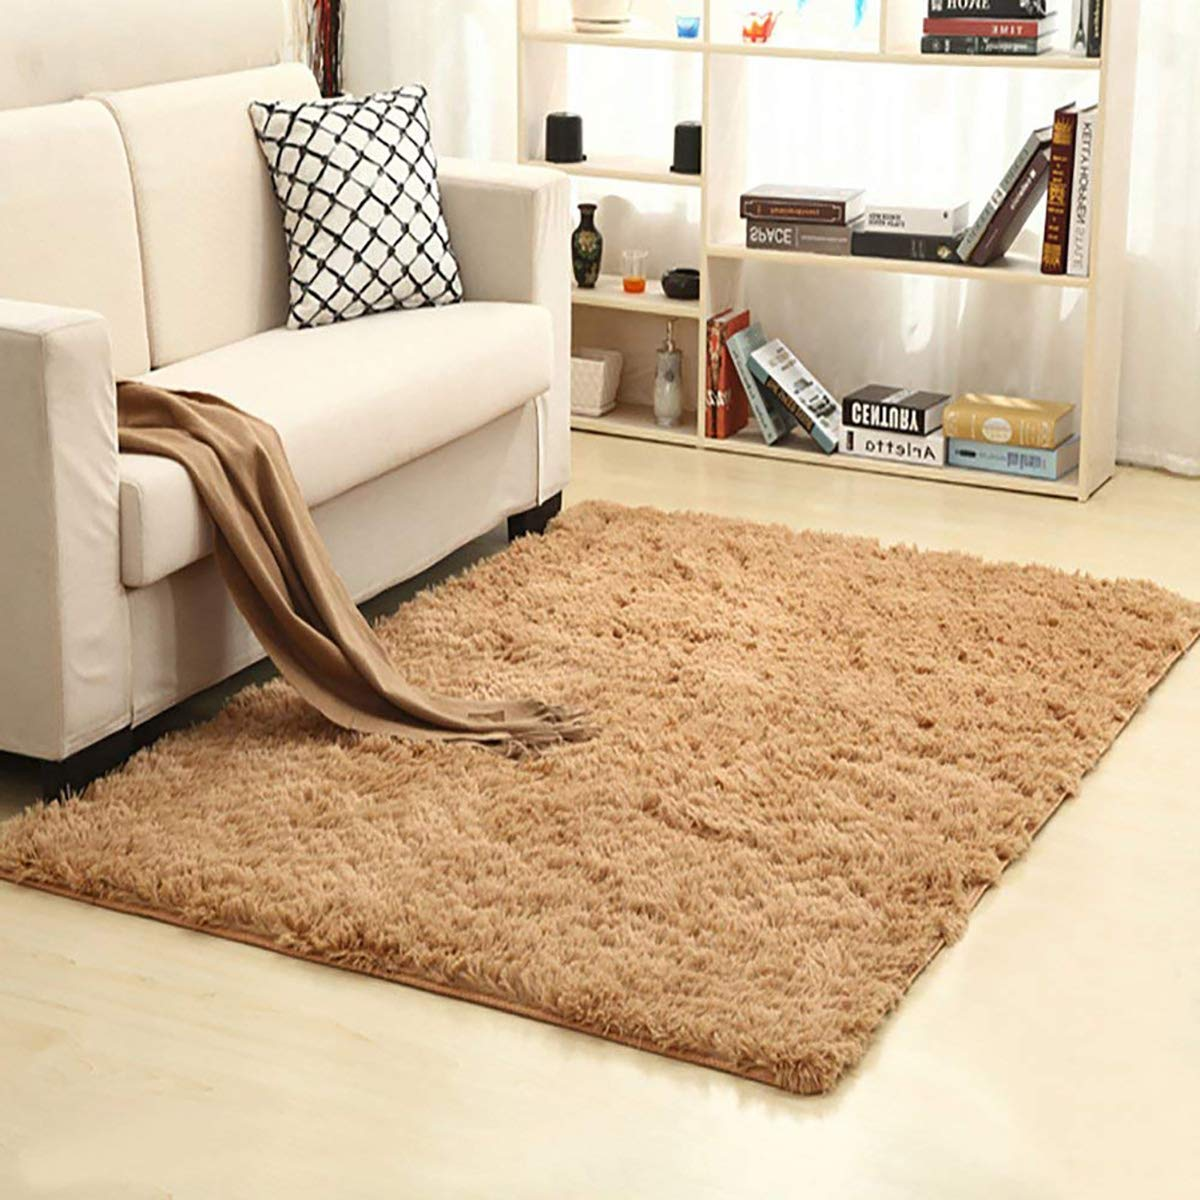 Khaki 120 Cm Ultra Soft Indoor Modern Area Rugs Fluffy Living Room Carpets Suitable For Children Bedroom Home Decor Nursery Rugs 60 Mimbarschool Com Ng